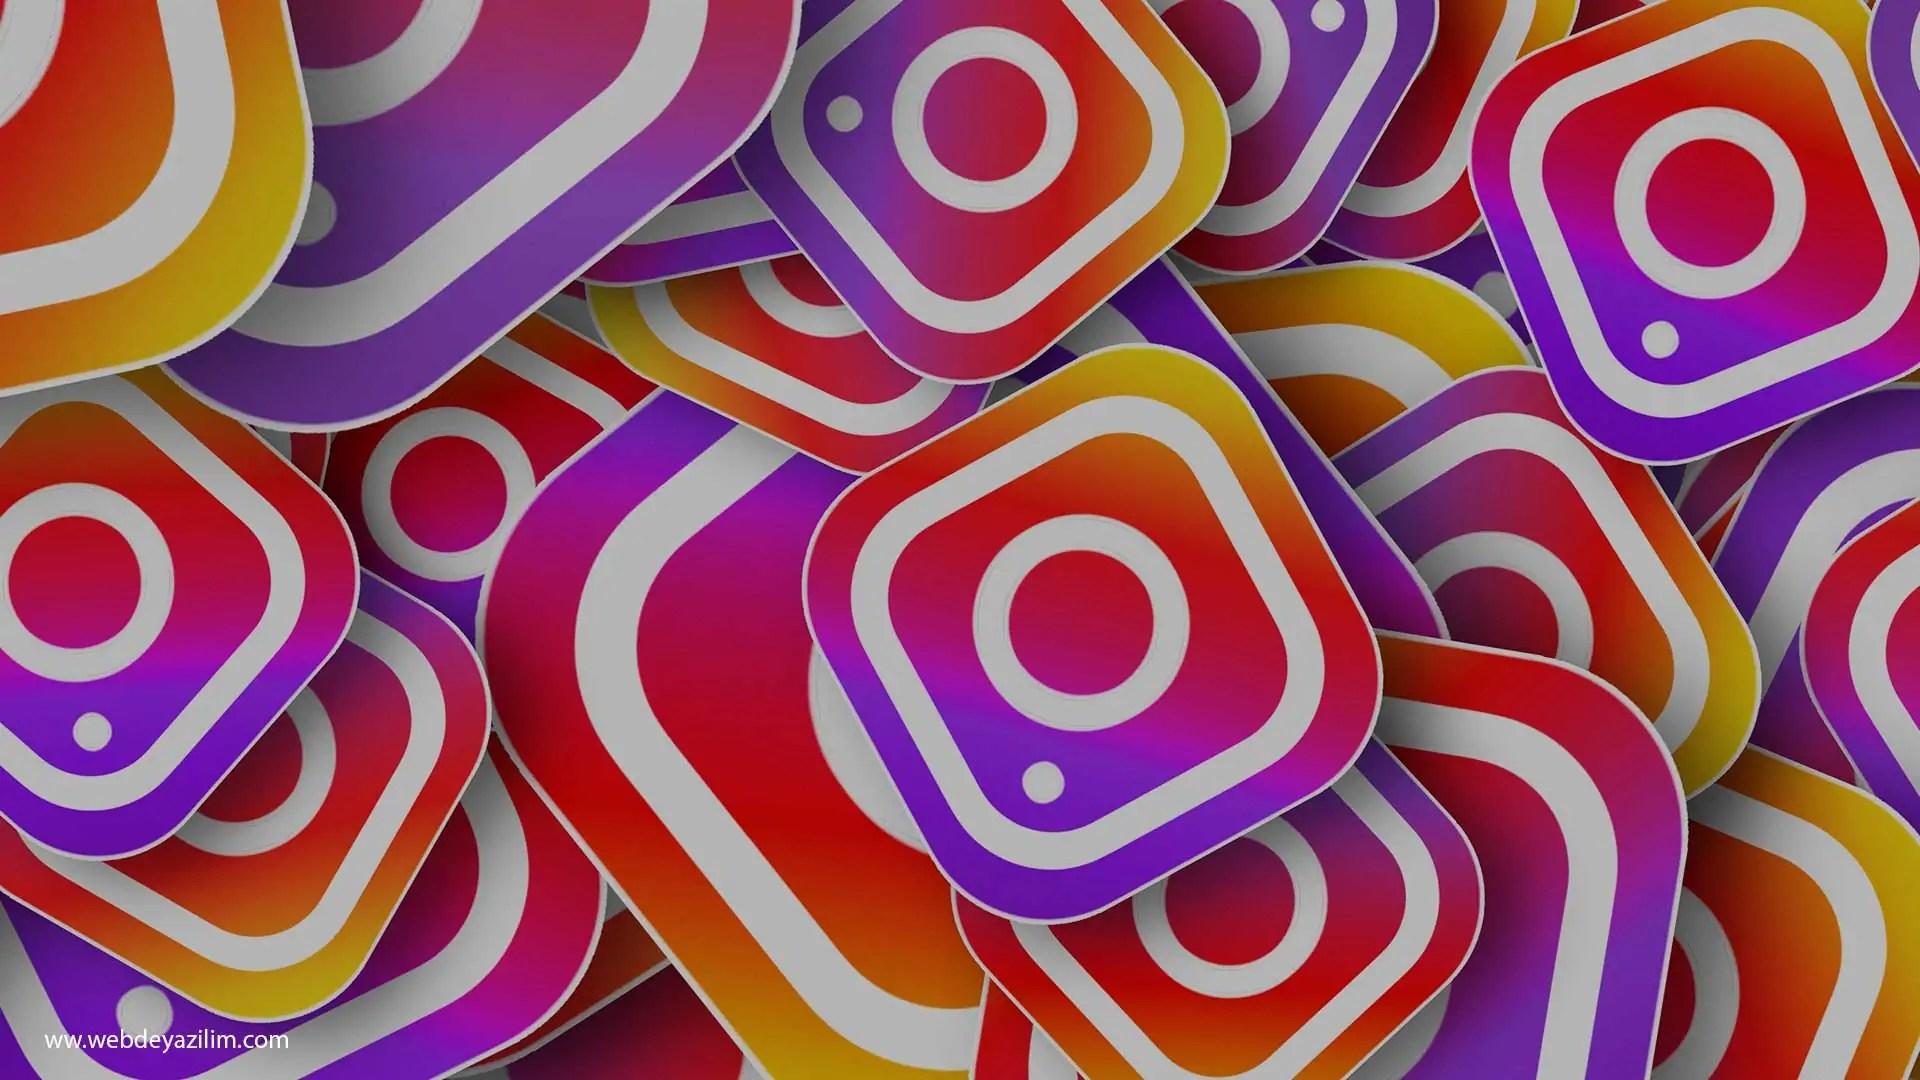 instagram takipci kasma 2020 en ucuz turk takipci satin al youtube Instagram Takipci Satin Al Instagram Begeni Satin Al 2020 Guncel